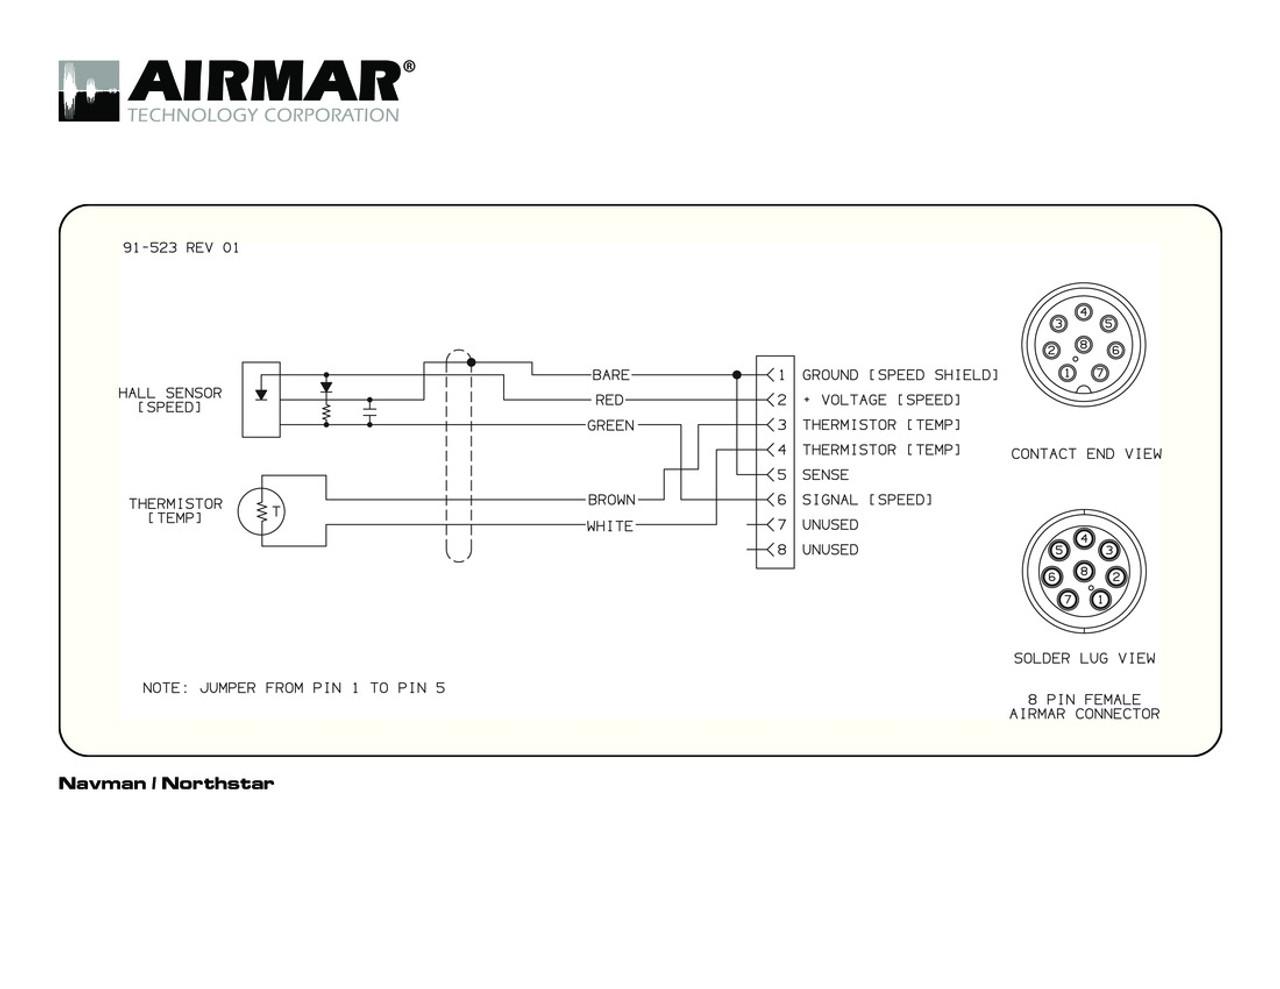 medium resolution of airmar wiring diagram navman northstar blue bottle marine mercruiser smartcraft wiring diagram northstar wiring diagram